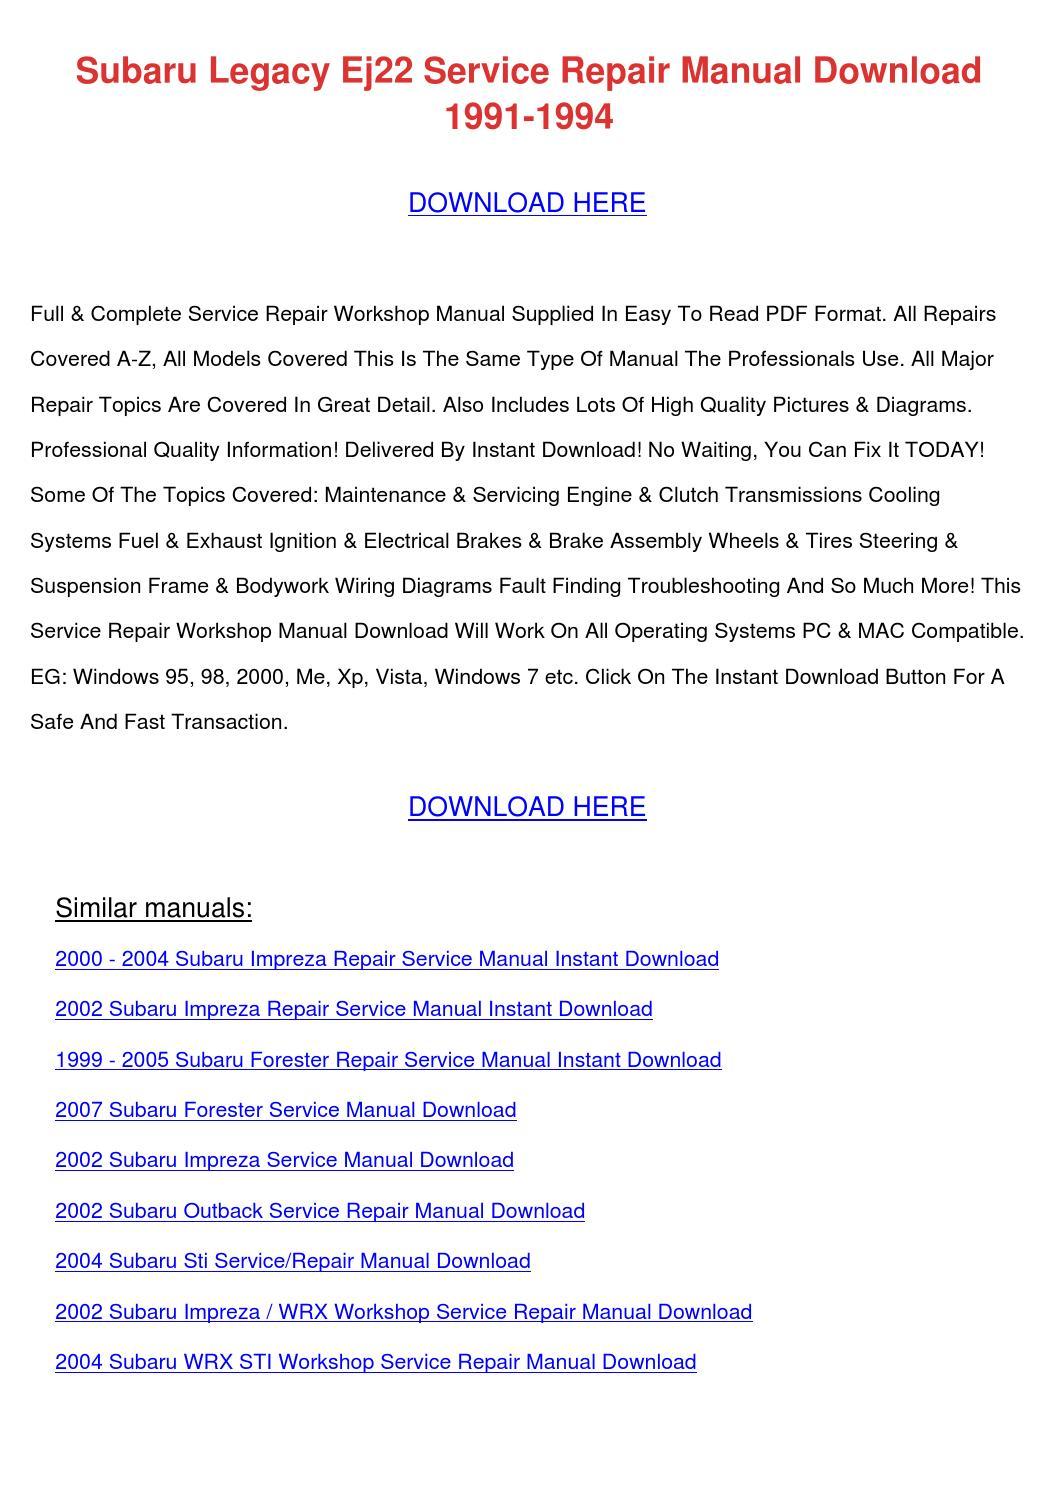 Subaru Legacy Ej22 Service Repair Manual Down by SondraShockley ...